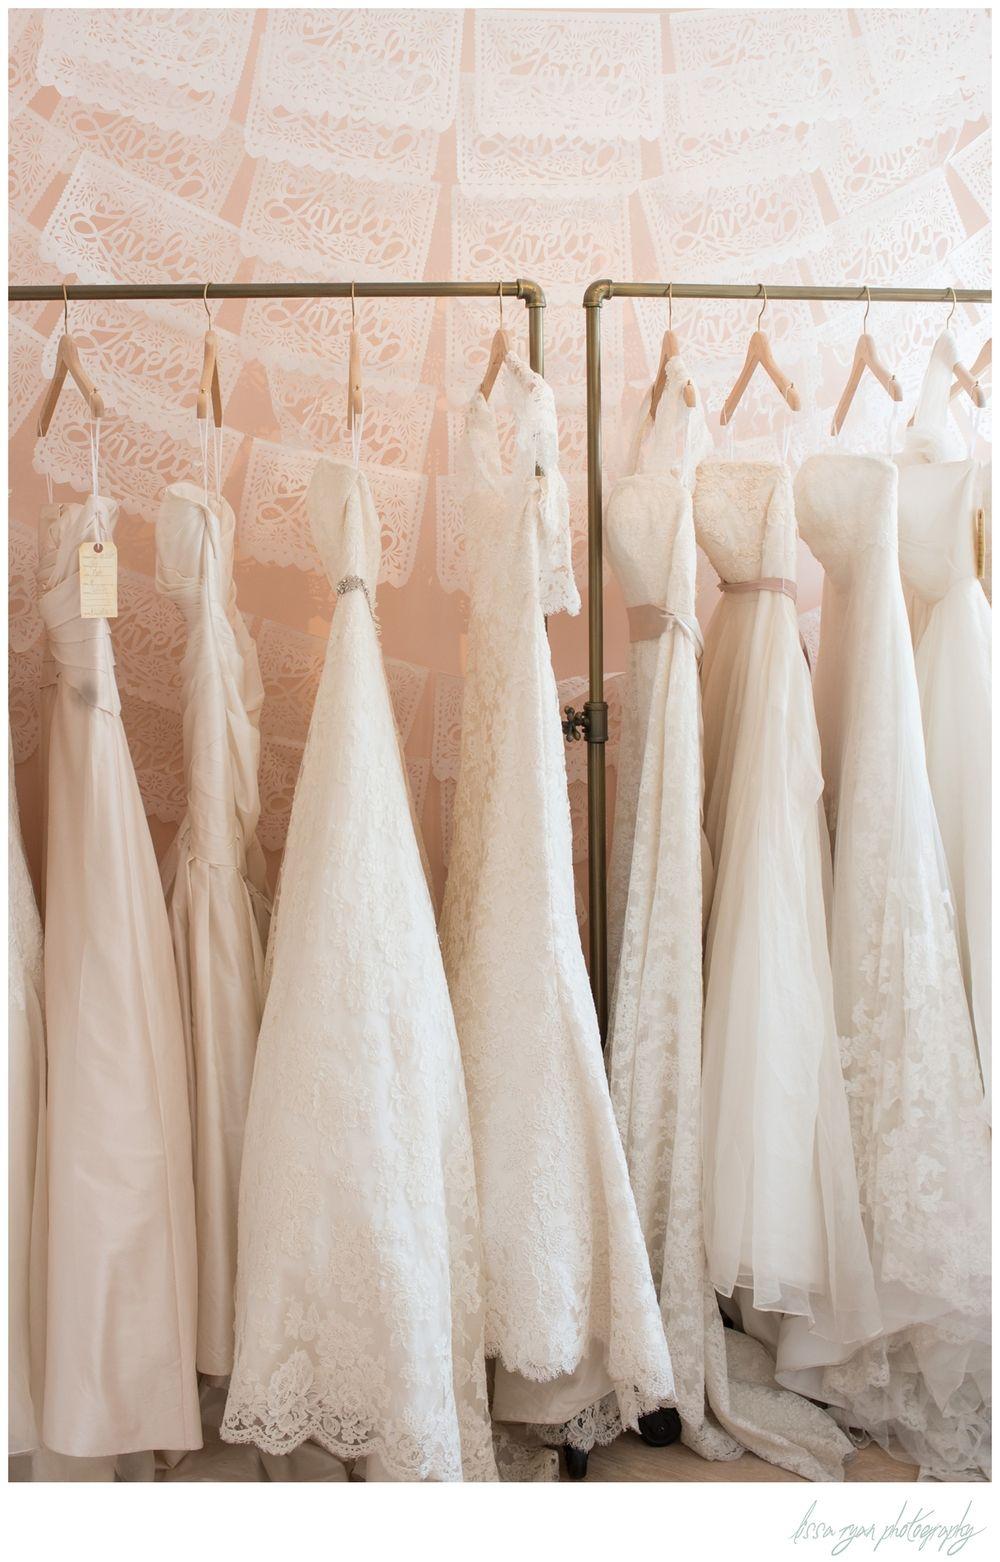 Lovely Dc Wedding Dress Bridal Shop Washington Photographer Lissa Ryan Photography